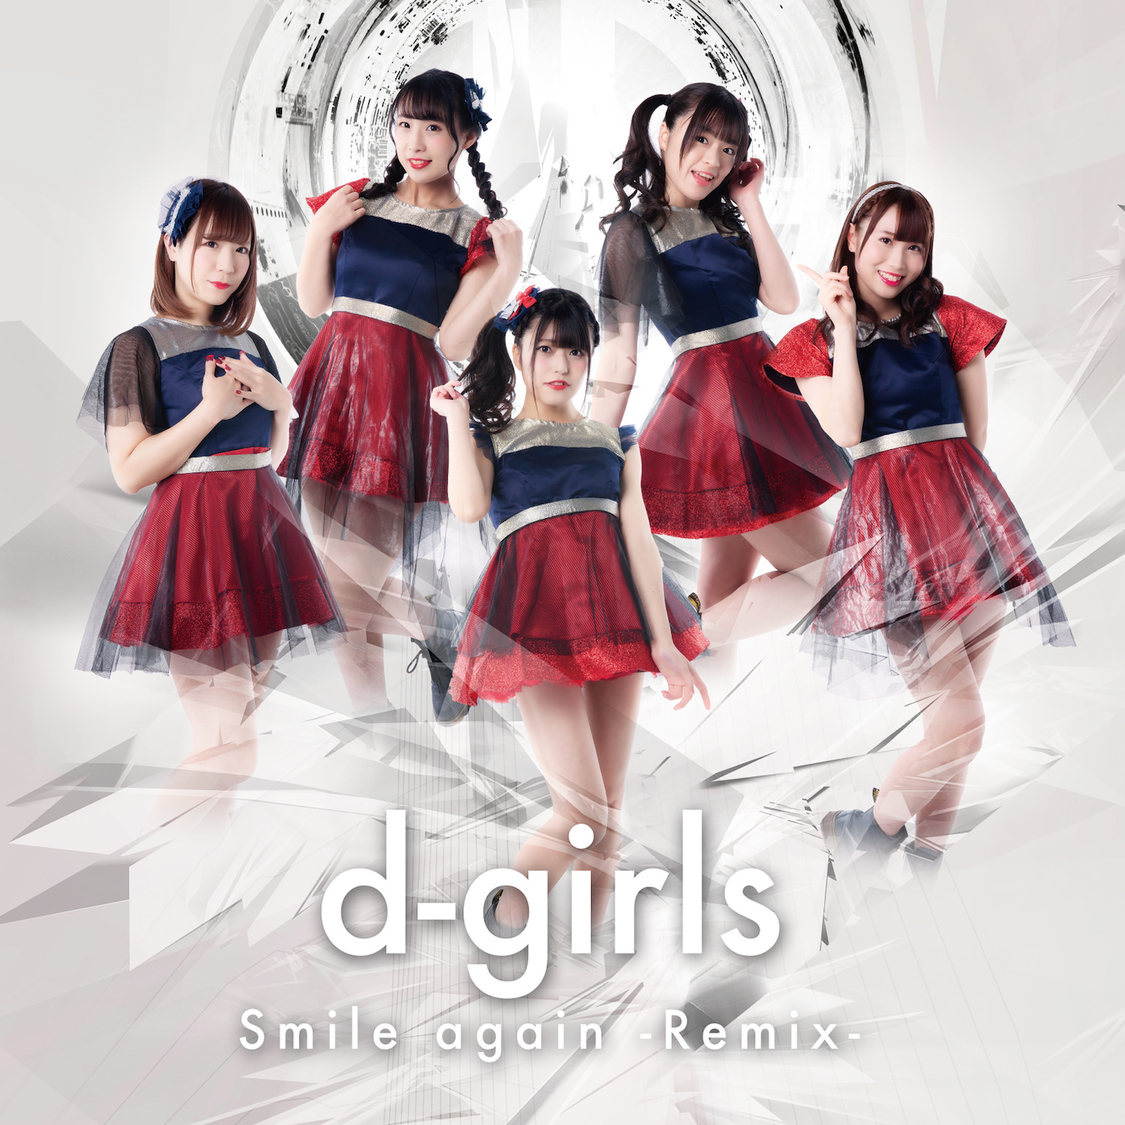 d-girls、「Smile again」リミックスALリリース。コンテスト最終選考曲を全収録